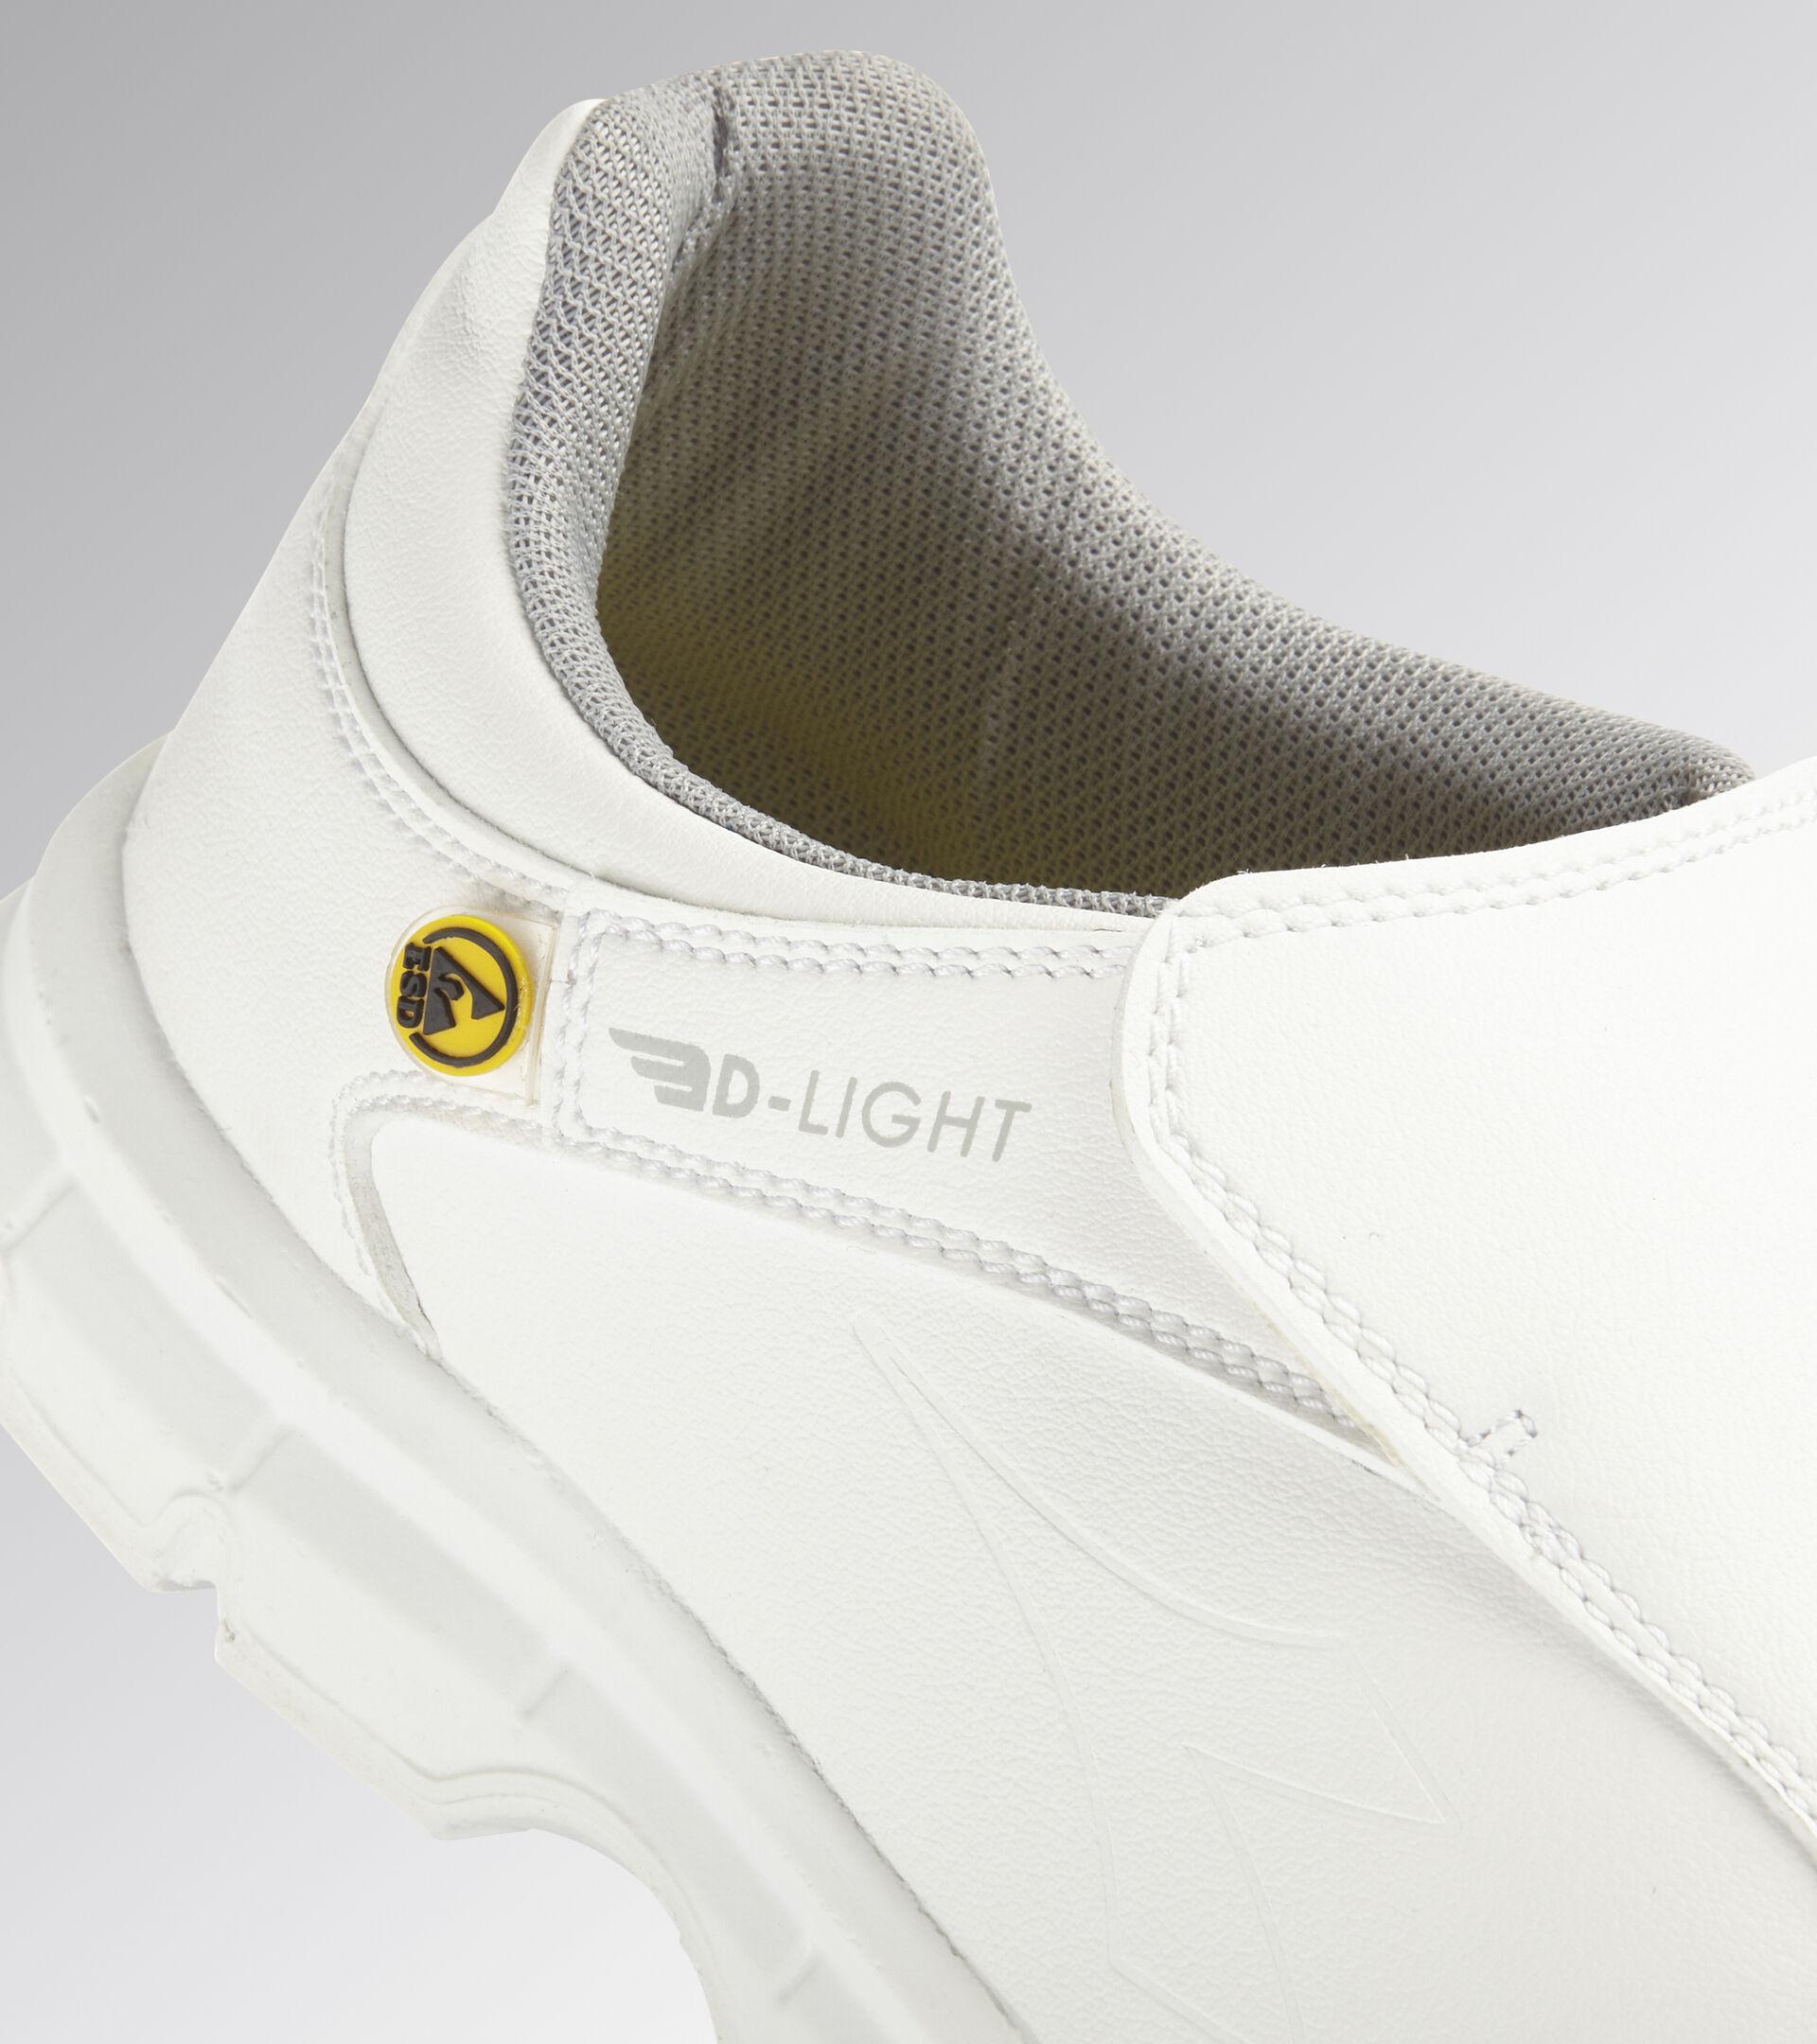 Footwear Utility UNISEX RUN MICRO LOW S2 SRC ESD WHITE Utility